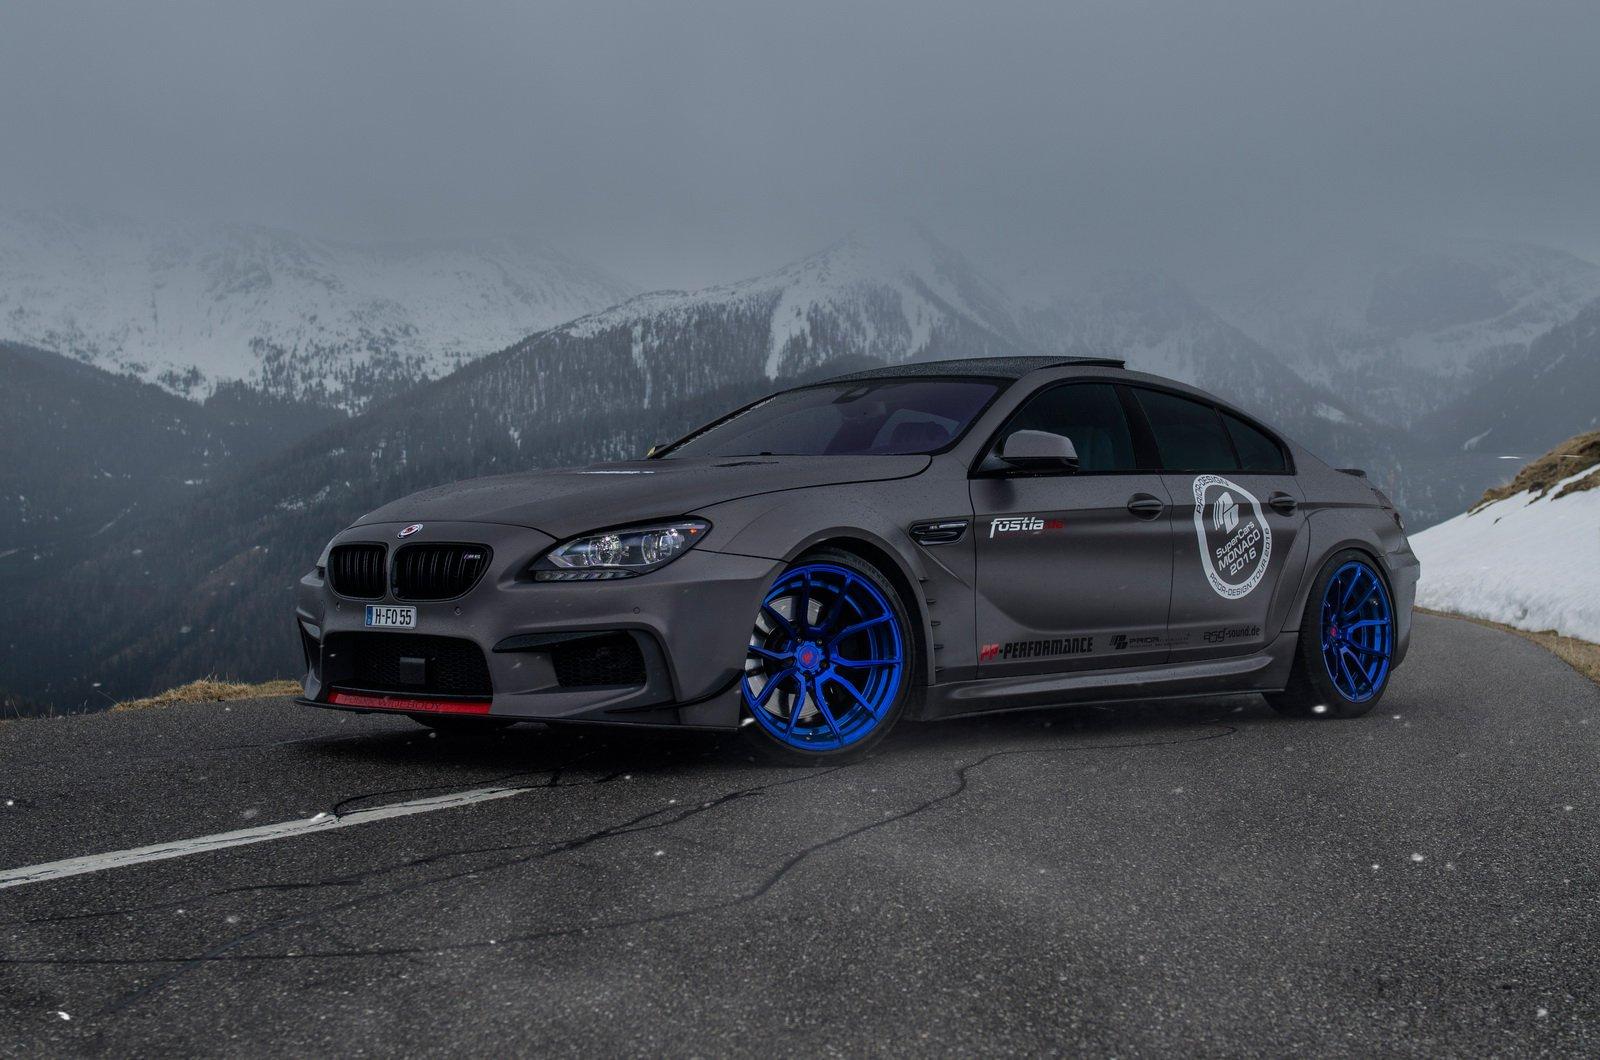 BMW 650ix Gran Coupe в исполнении Fostla